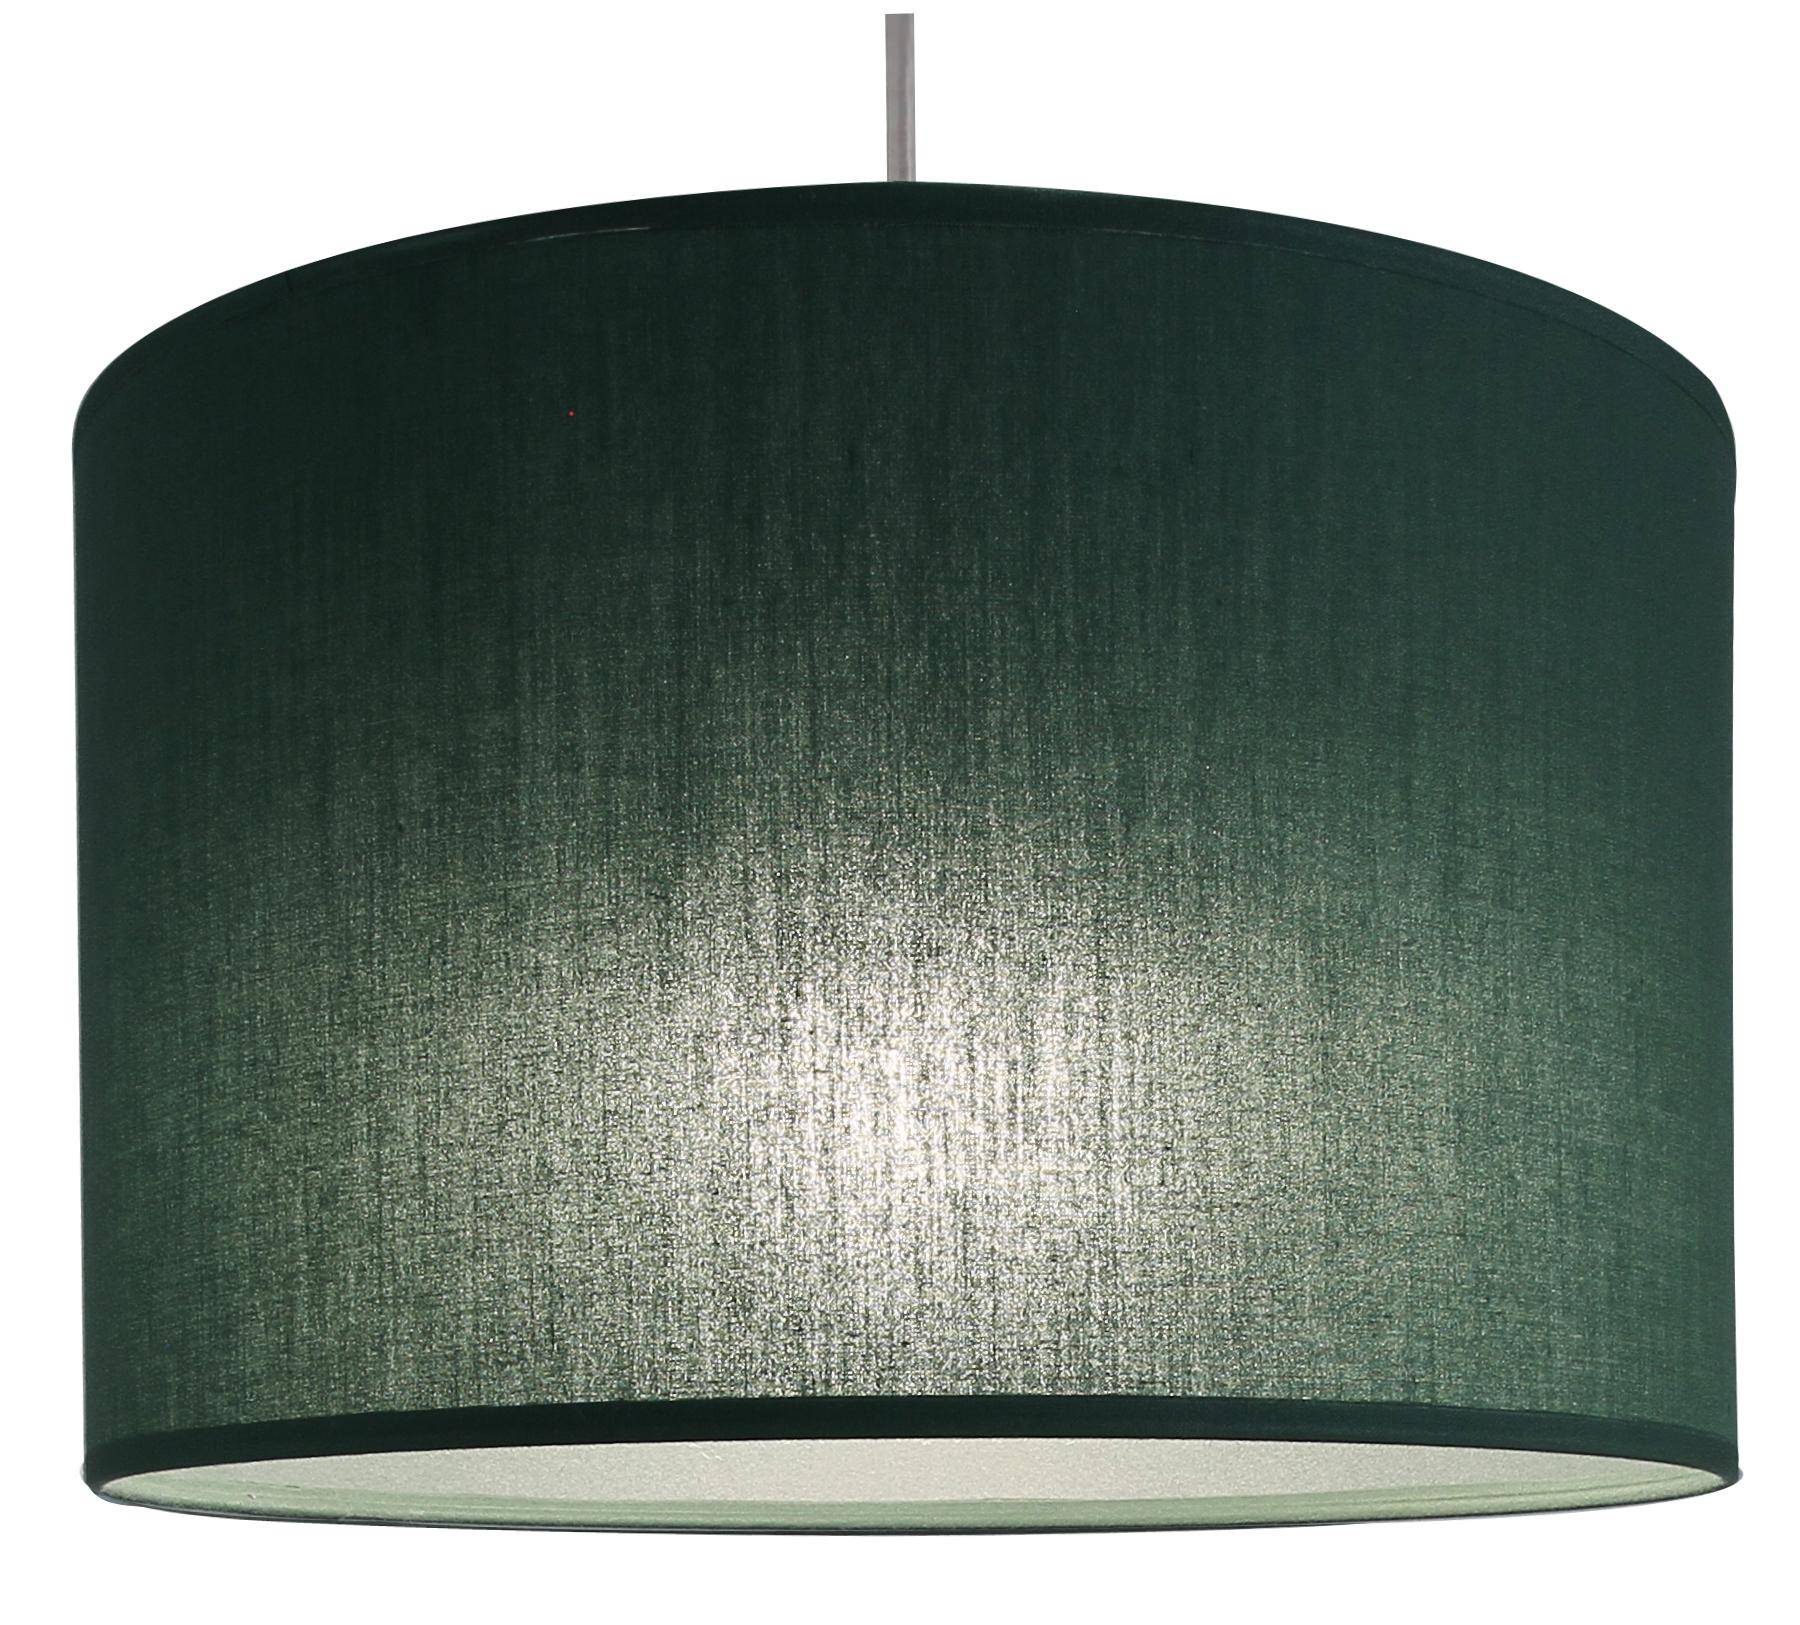 Suspension cylindre vert tropique transparent, 29 cm